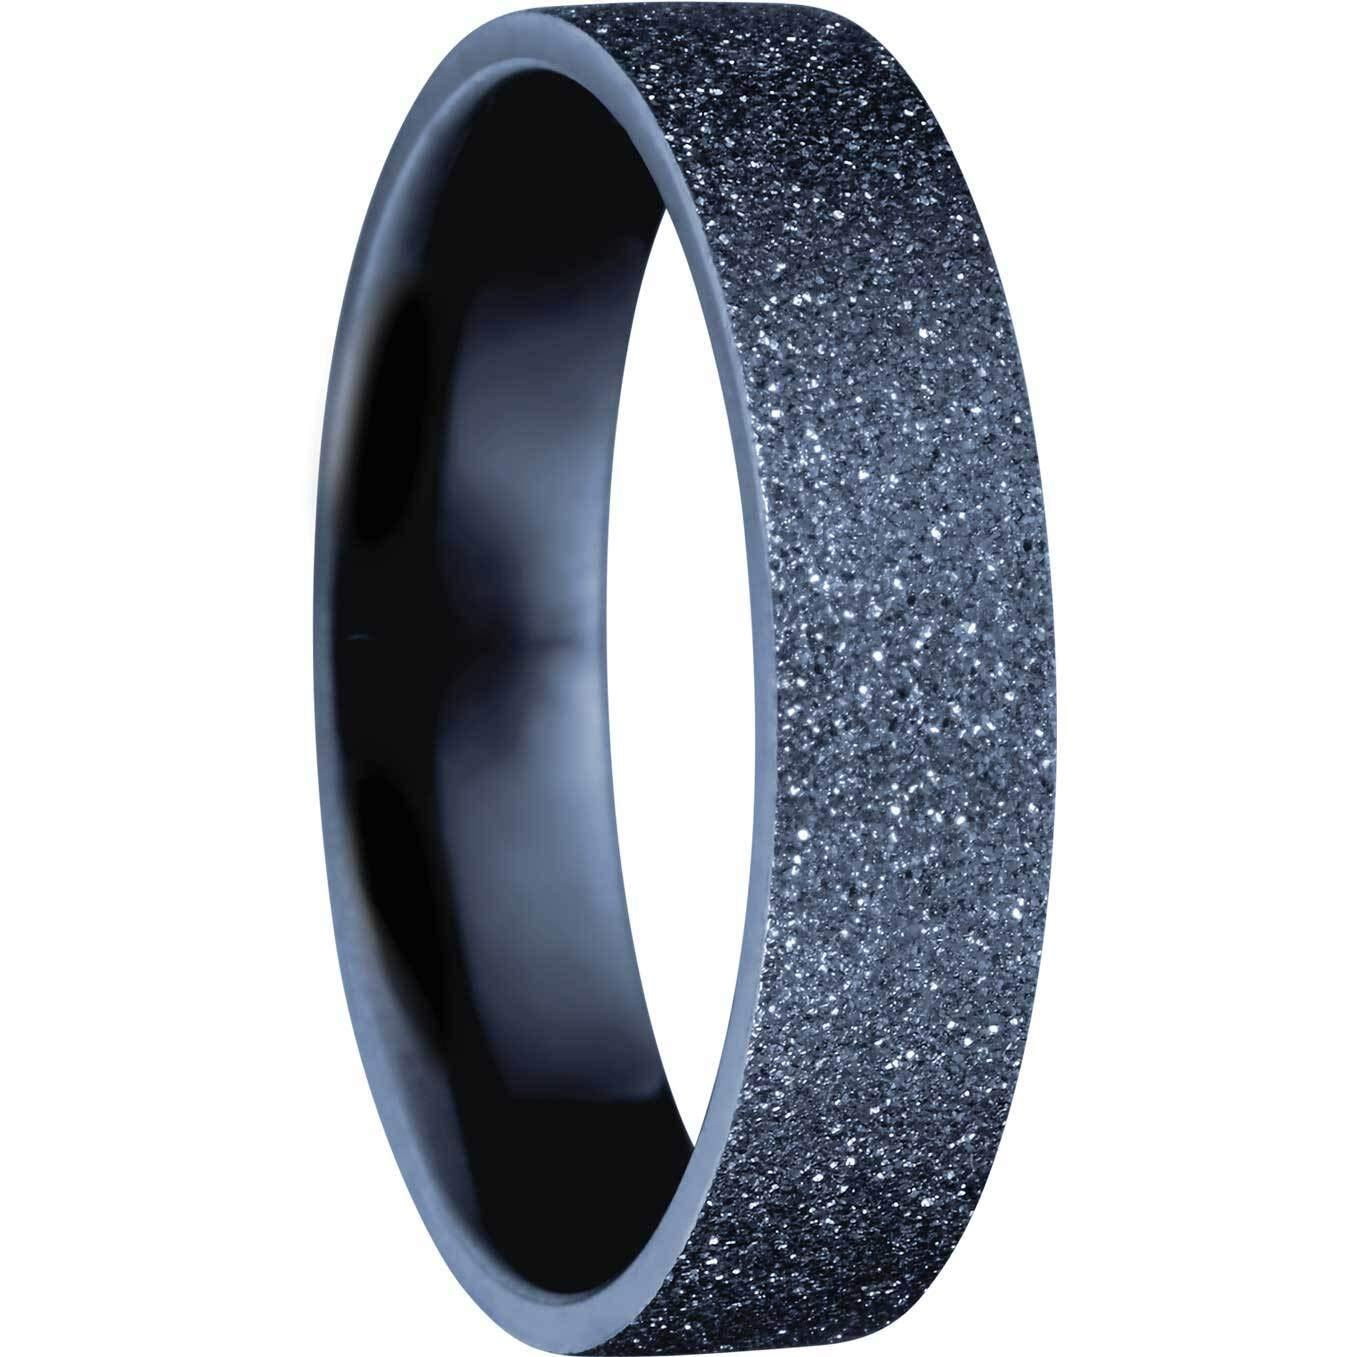 Bering Innenring 557-79-82 Stardust blau breit